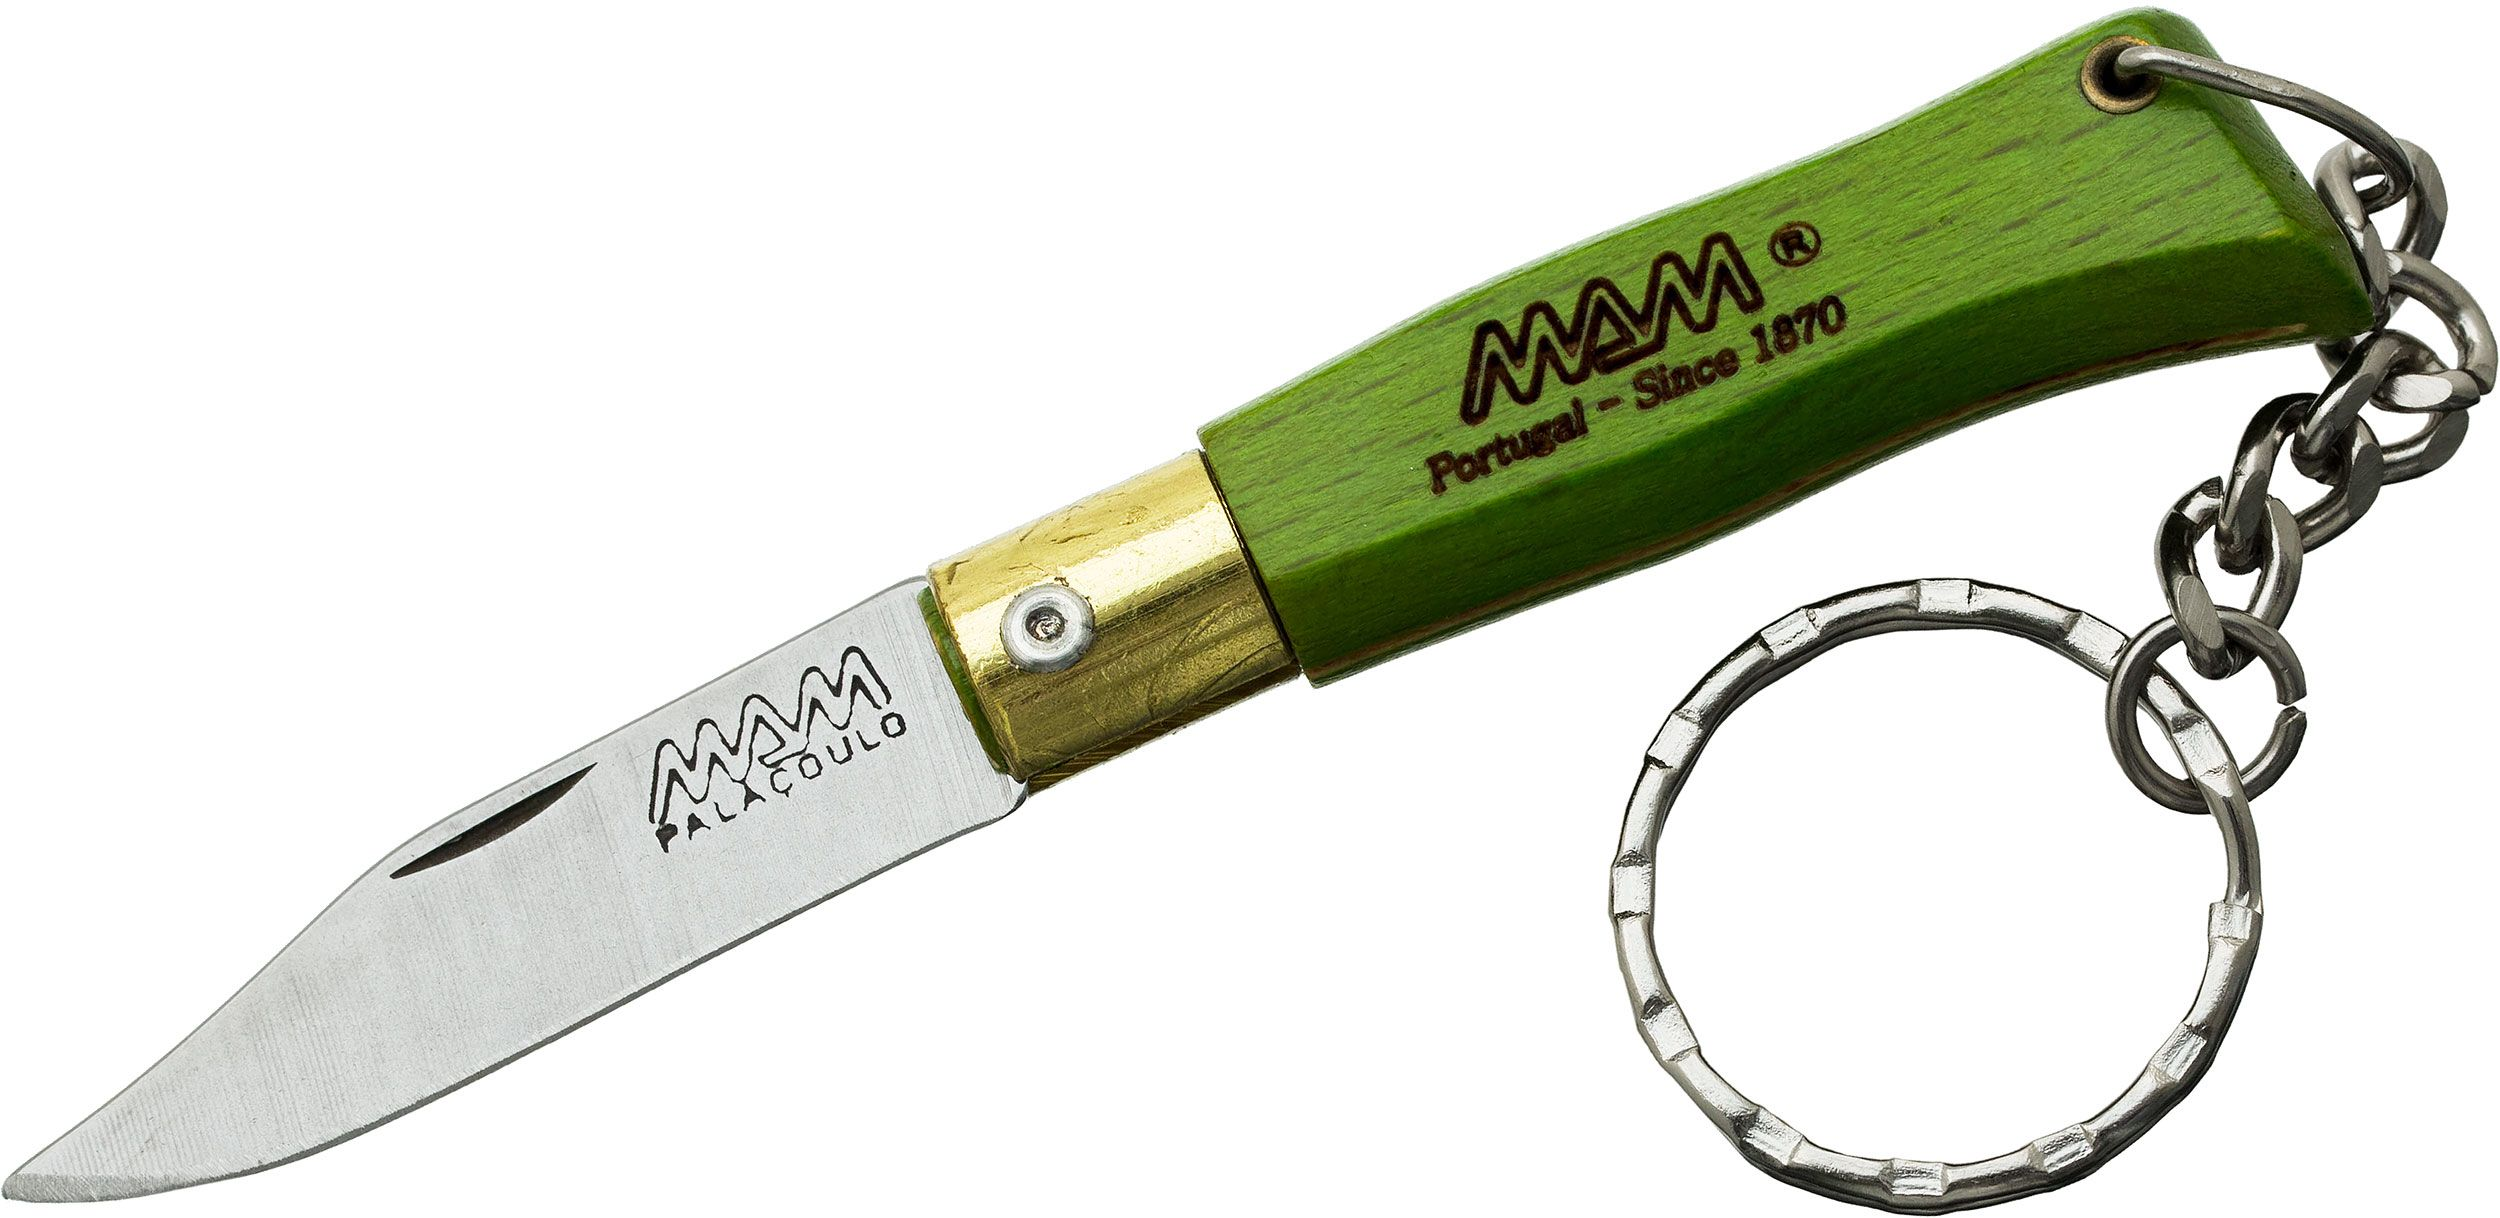 MAM Filmam 2002G Duoro Folding Key Ring Knife 1.625 inch Clip Point Blade, Green Beechwood Handle